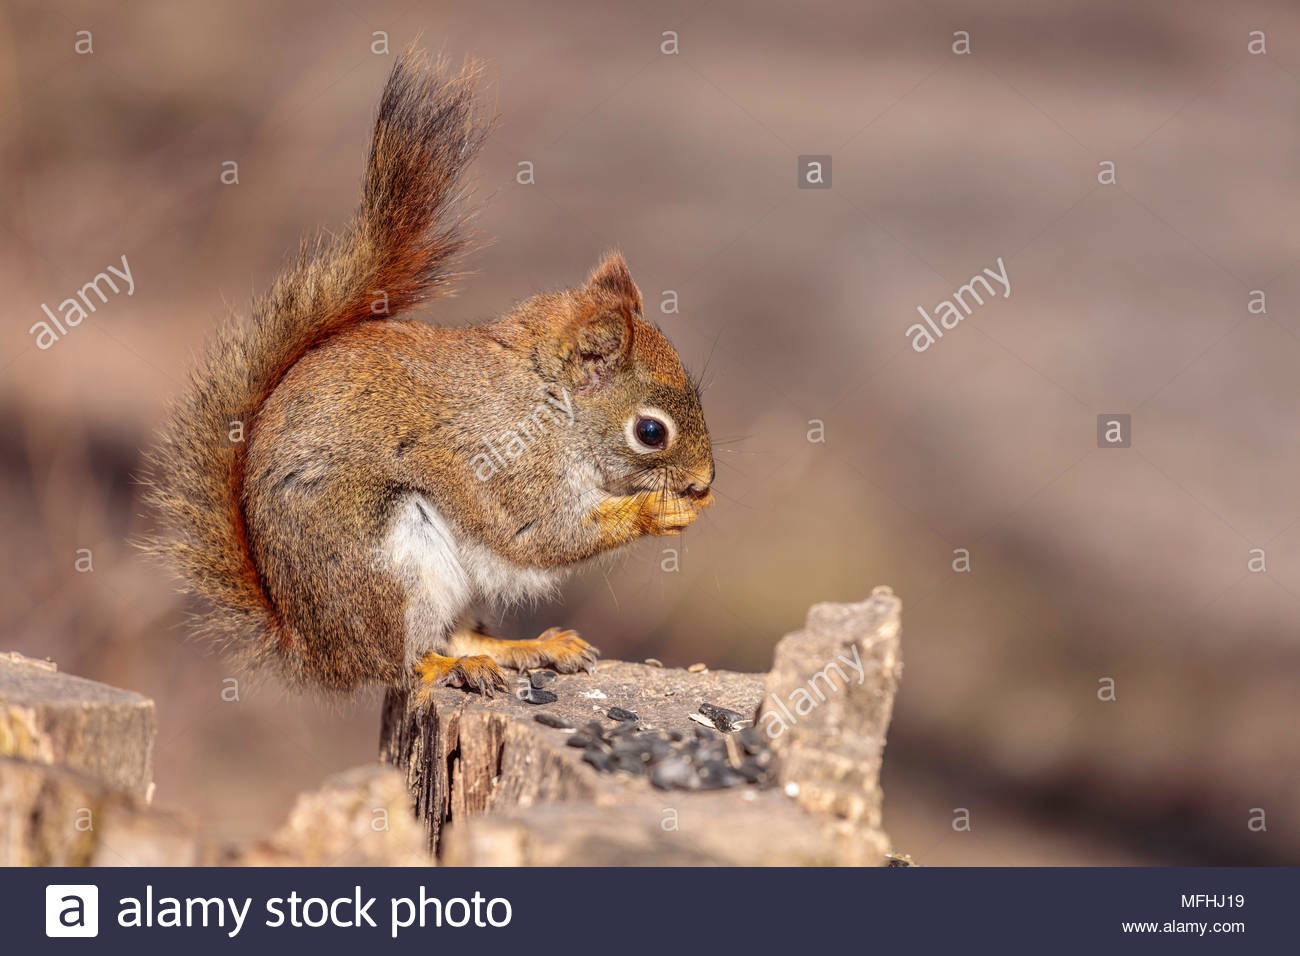 Ardilla roja americana Tamiasciurus hudsonicus pine ardilla ardilla roja norteamericana chickaree Whitby en Ontario, Canadá Foto de stock